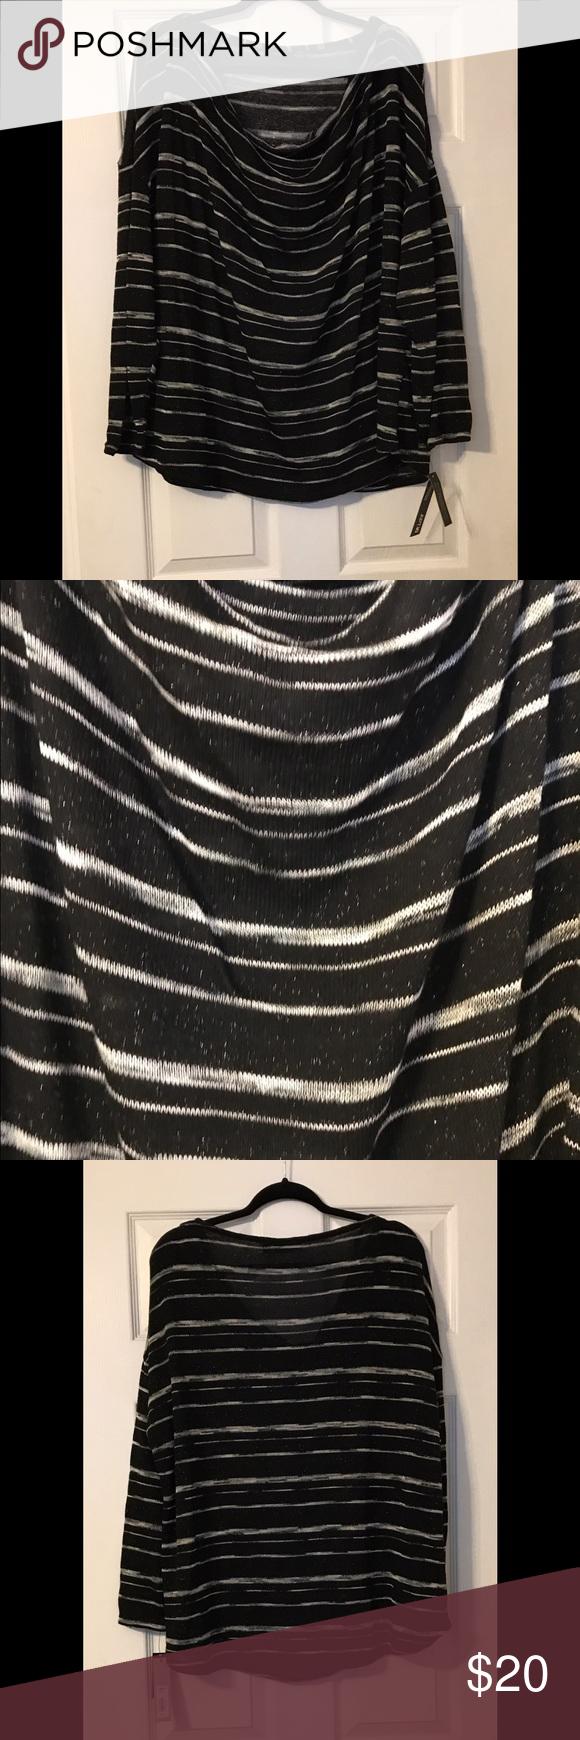 NWT black and white striped sweater - cowl neck NWT Apt 9 black and white striped sweater - cowl neck-size 2X Apt. 9 Sweaters Cowl & Turtlenecks